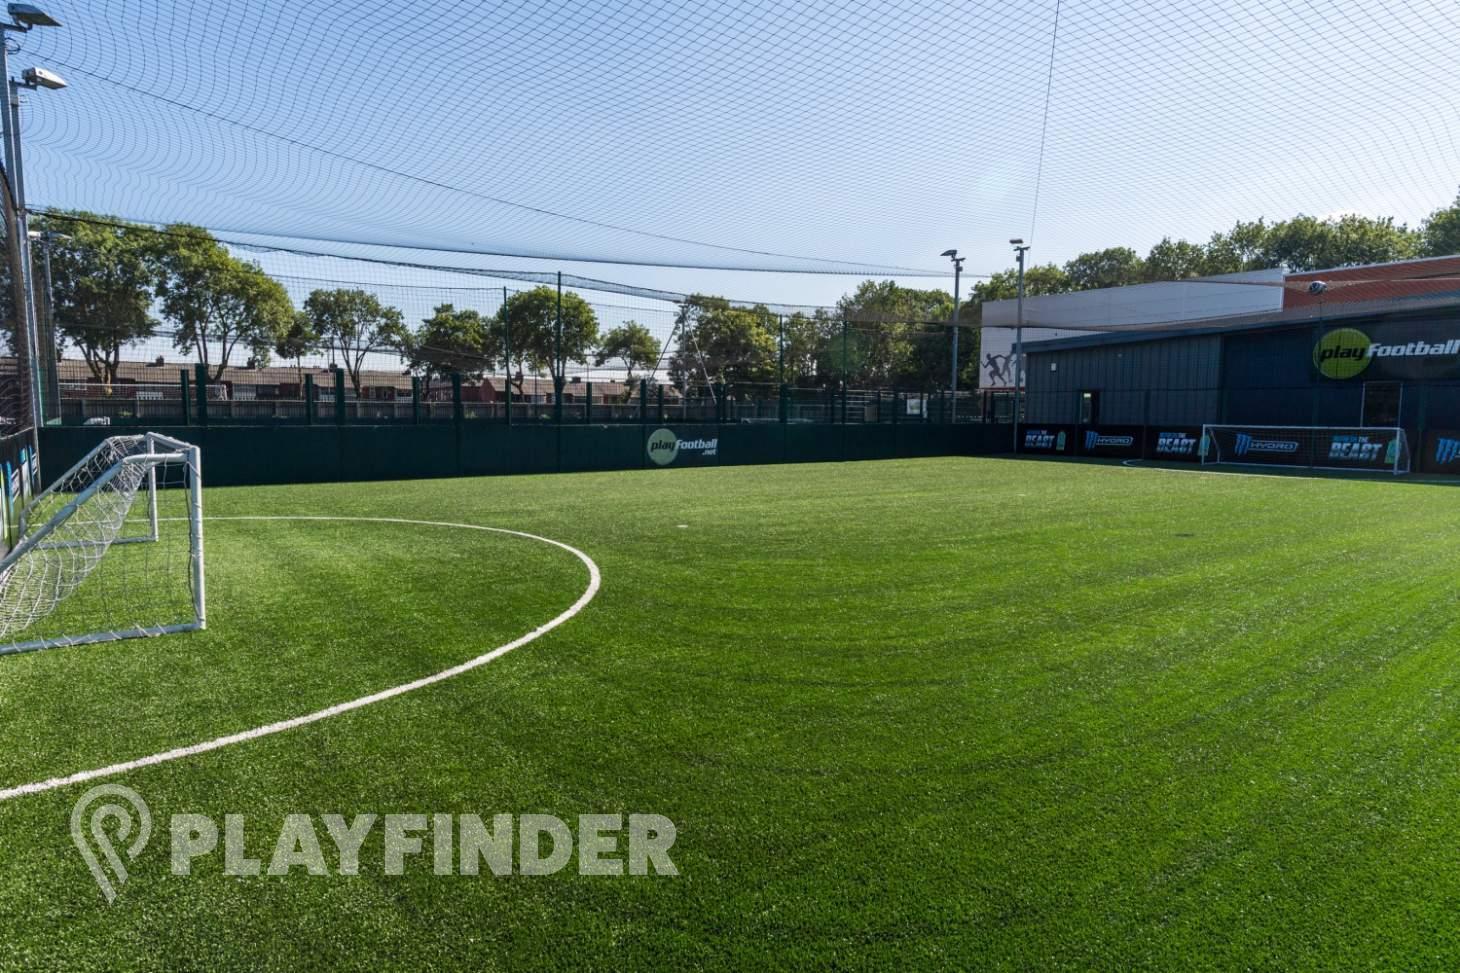 PlayFootball Bury 5 a side | 3G Astroturf football pitch